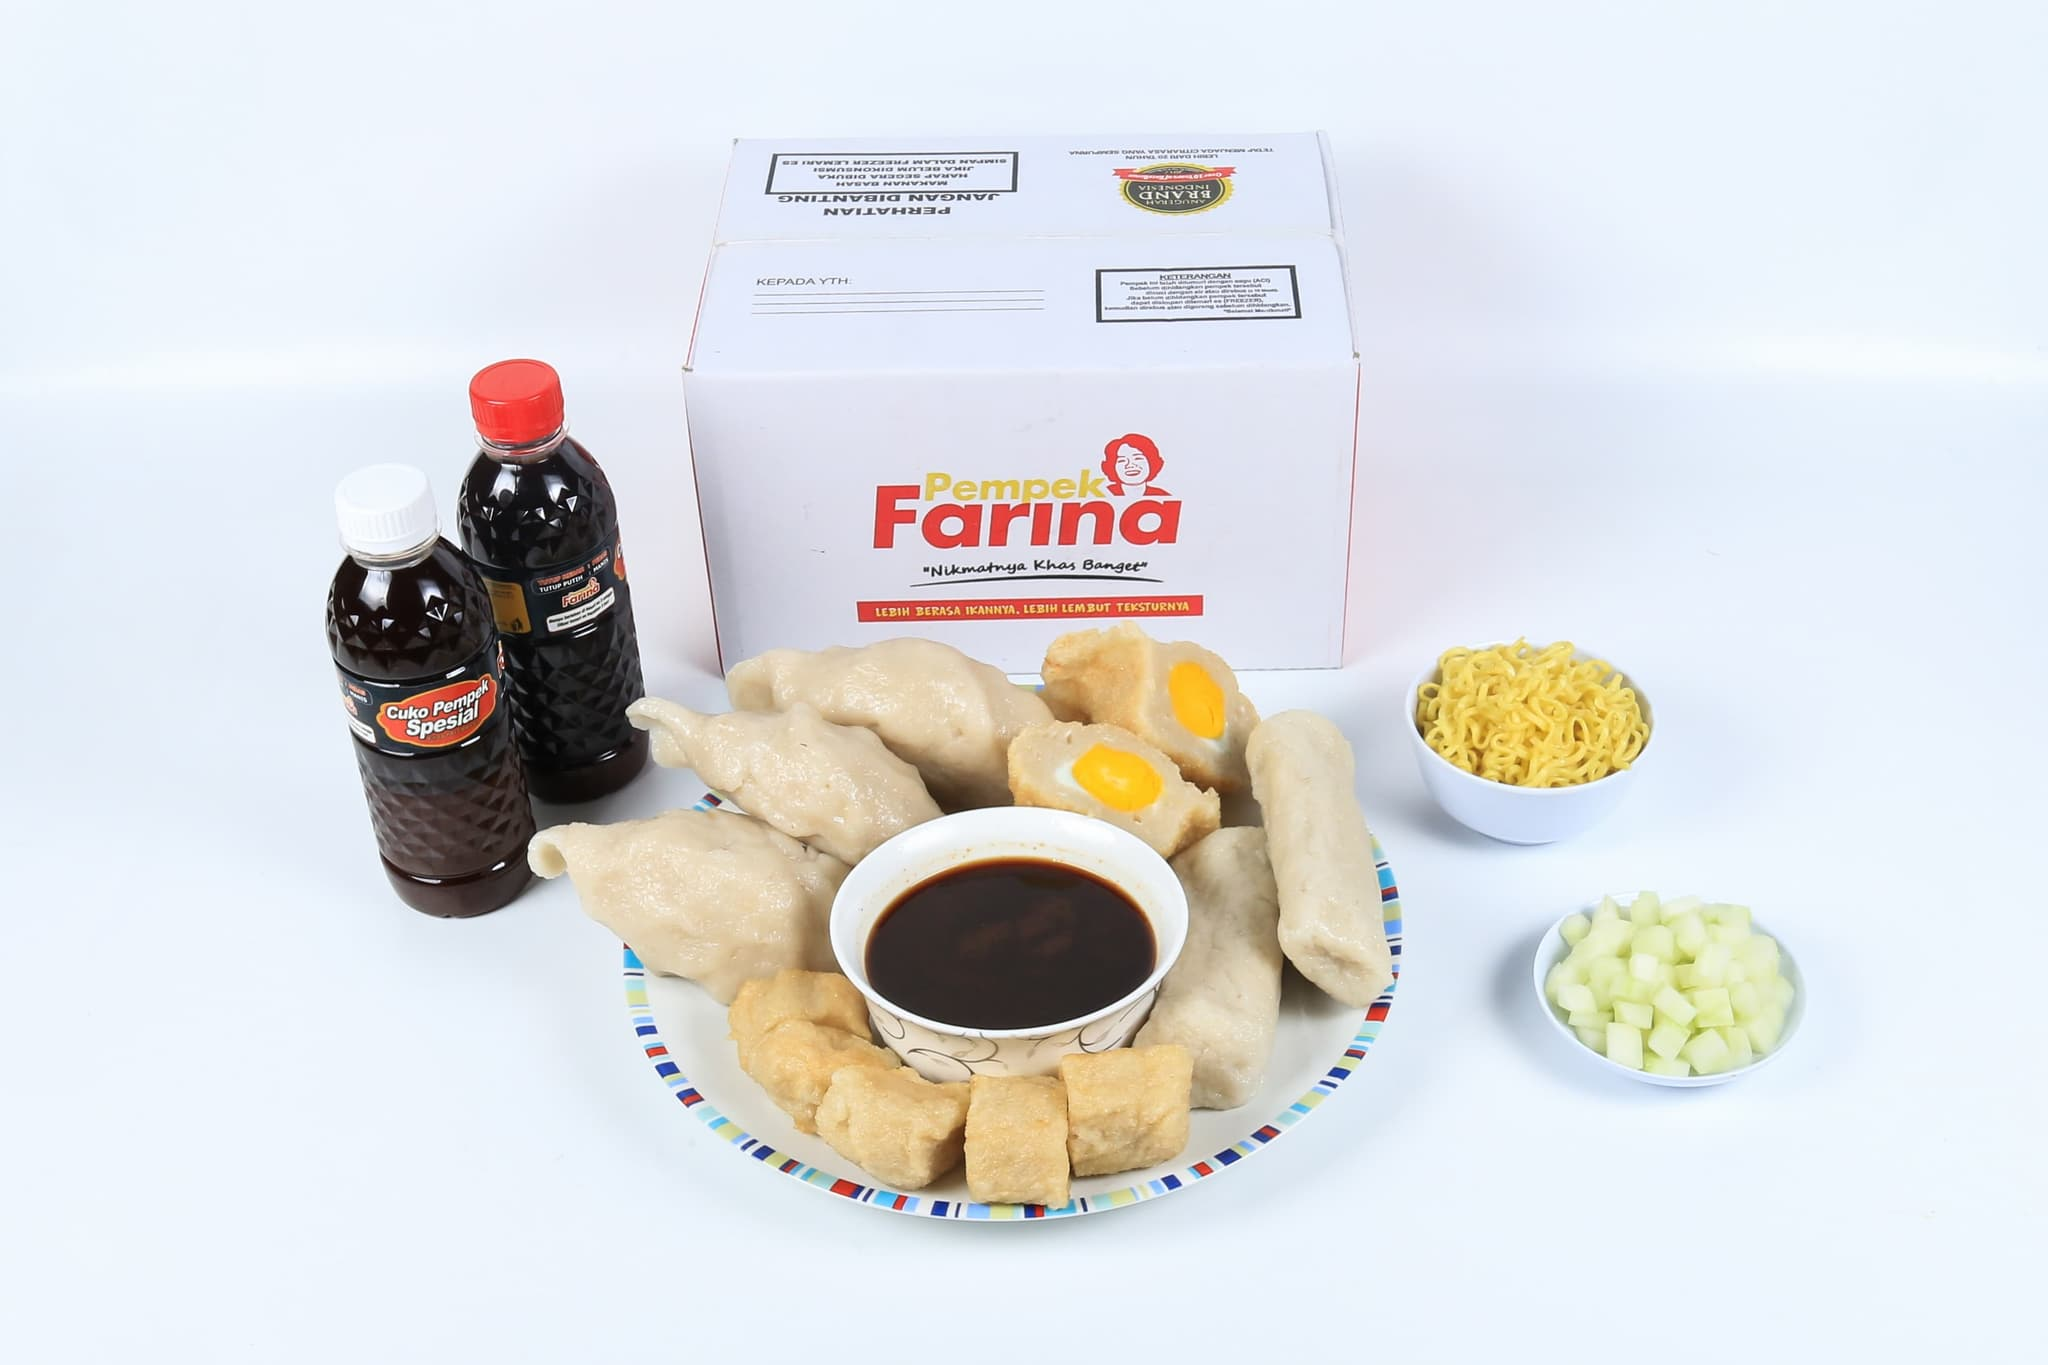 Pempek Farina Paket A6  - Blanja.com